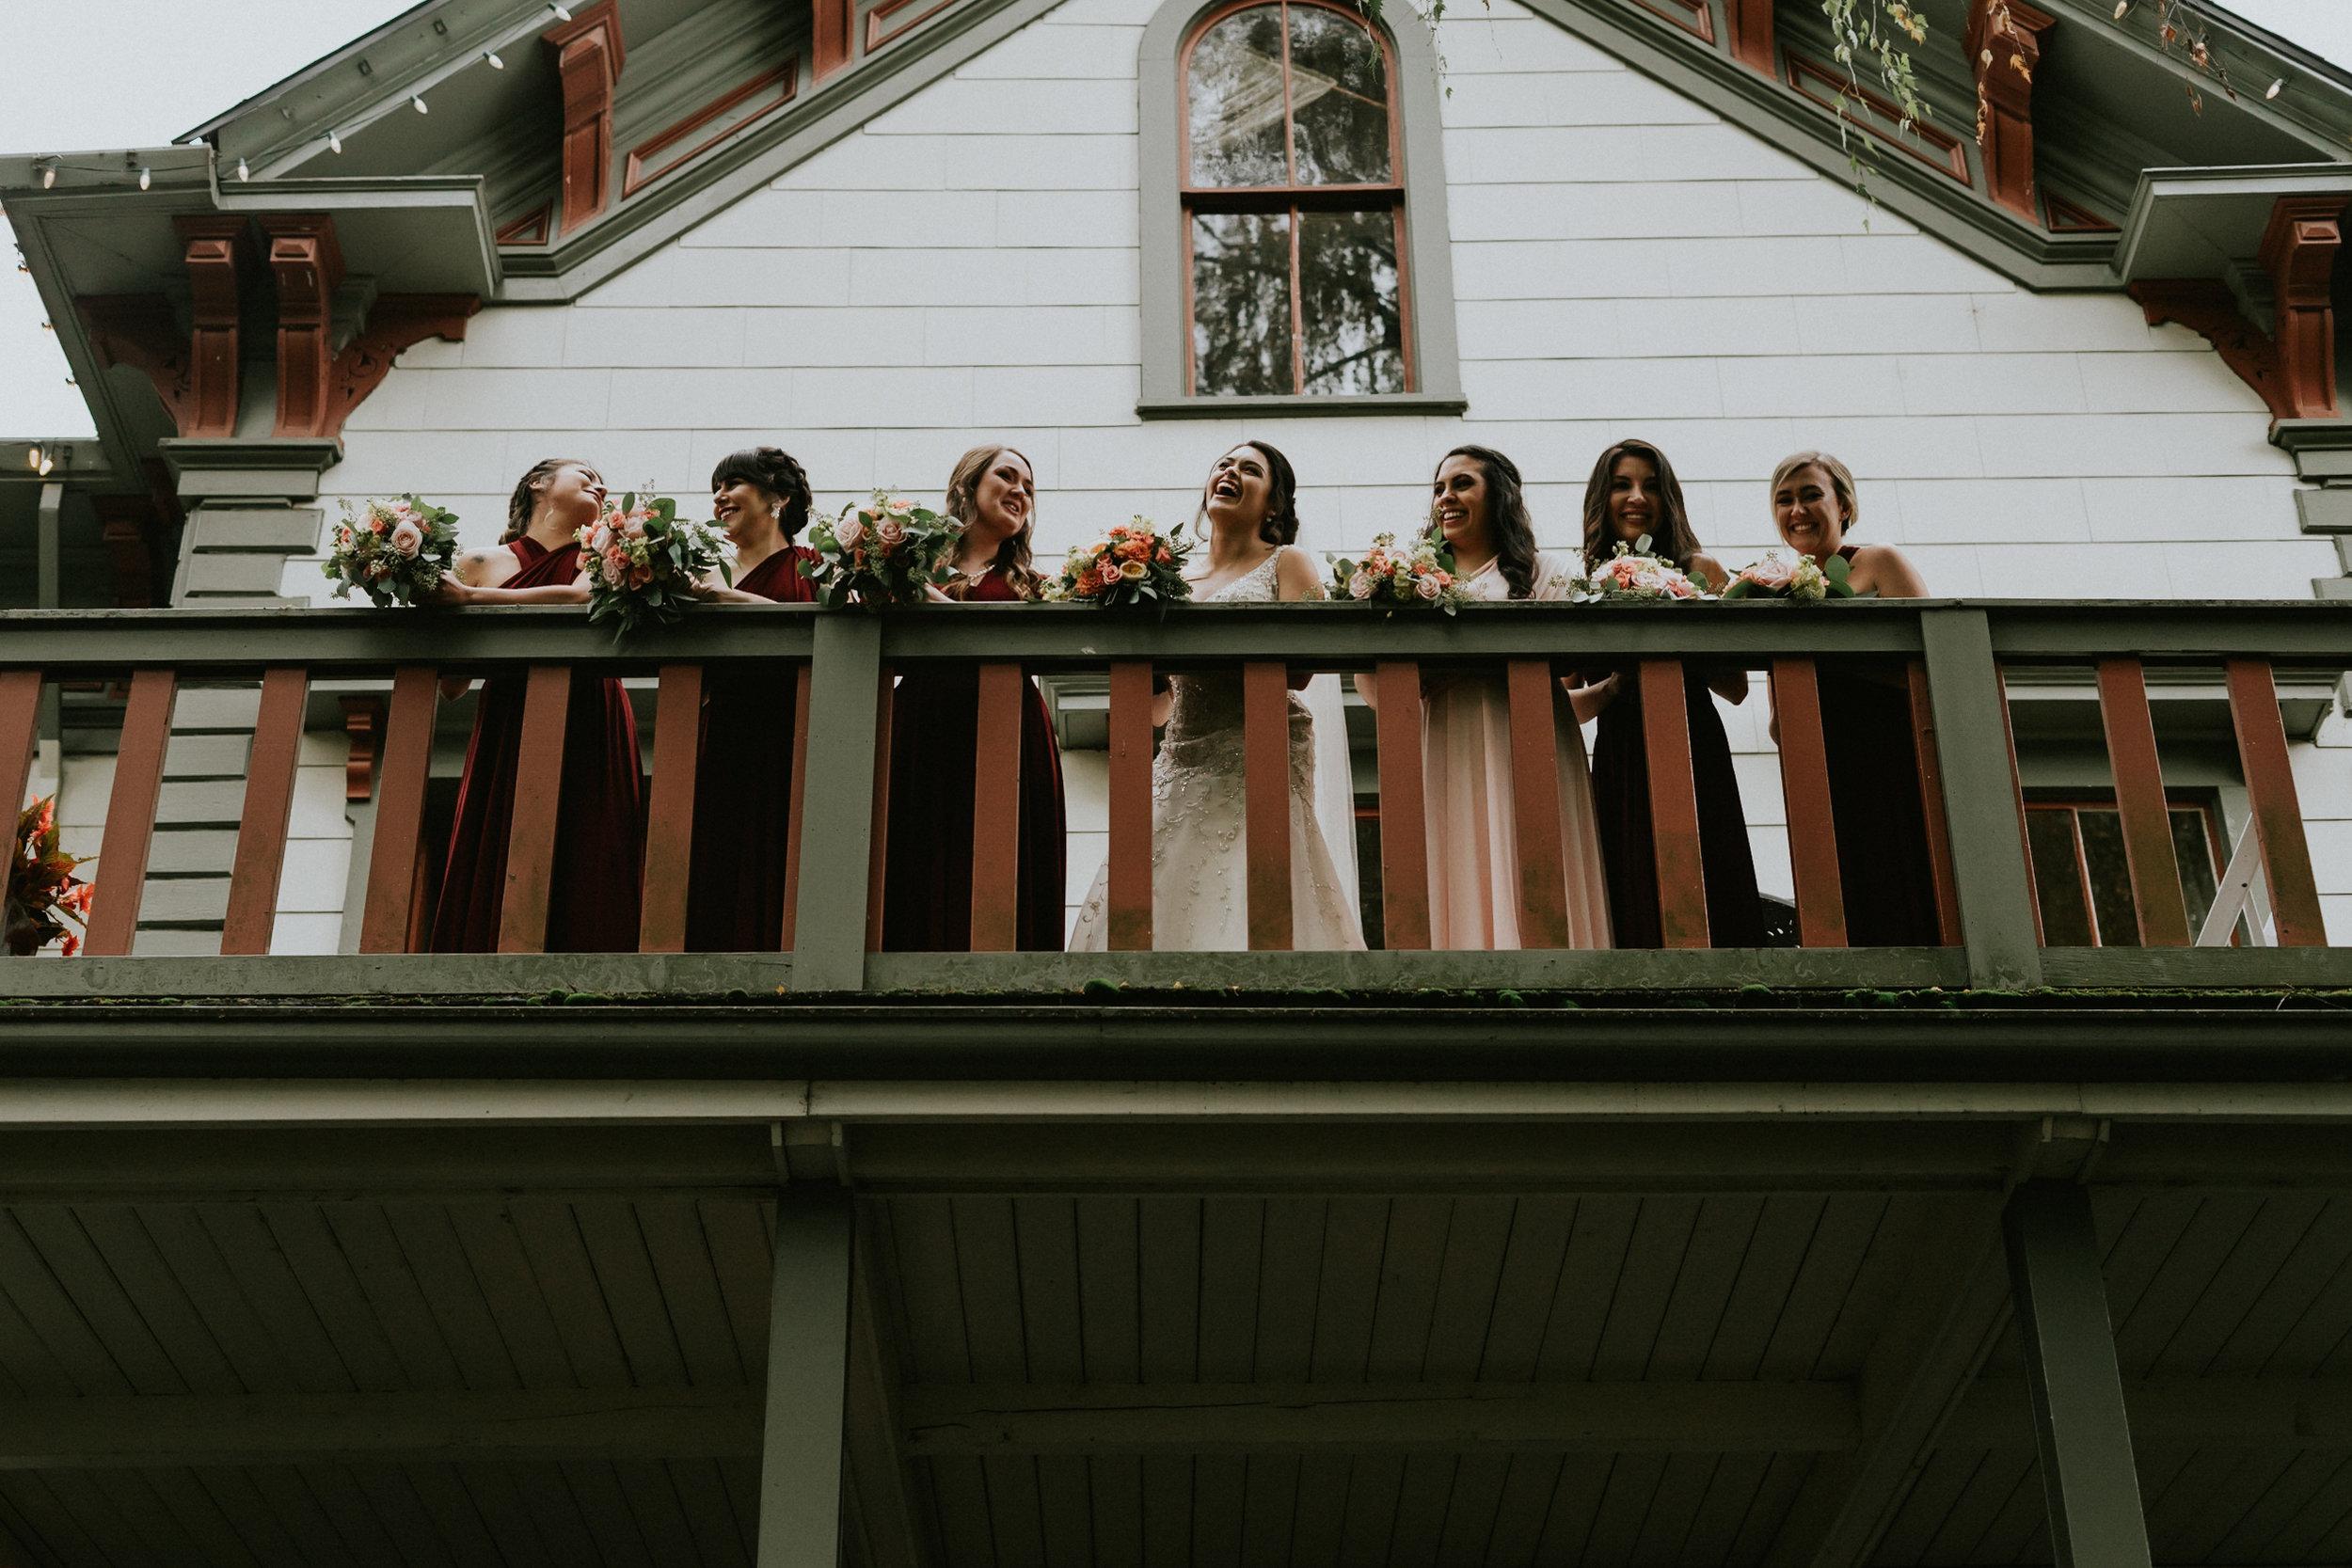 McMenamins_Cornelious_Pass_Roadhouse_wedding_photographer_AlfredTang-1.jpg